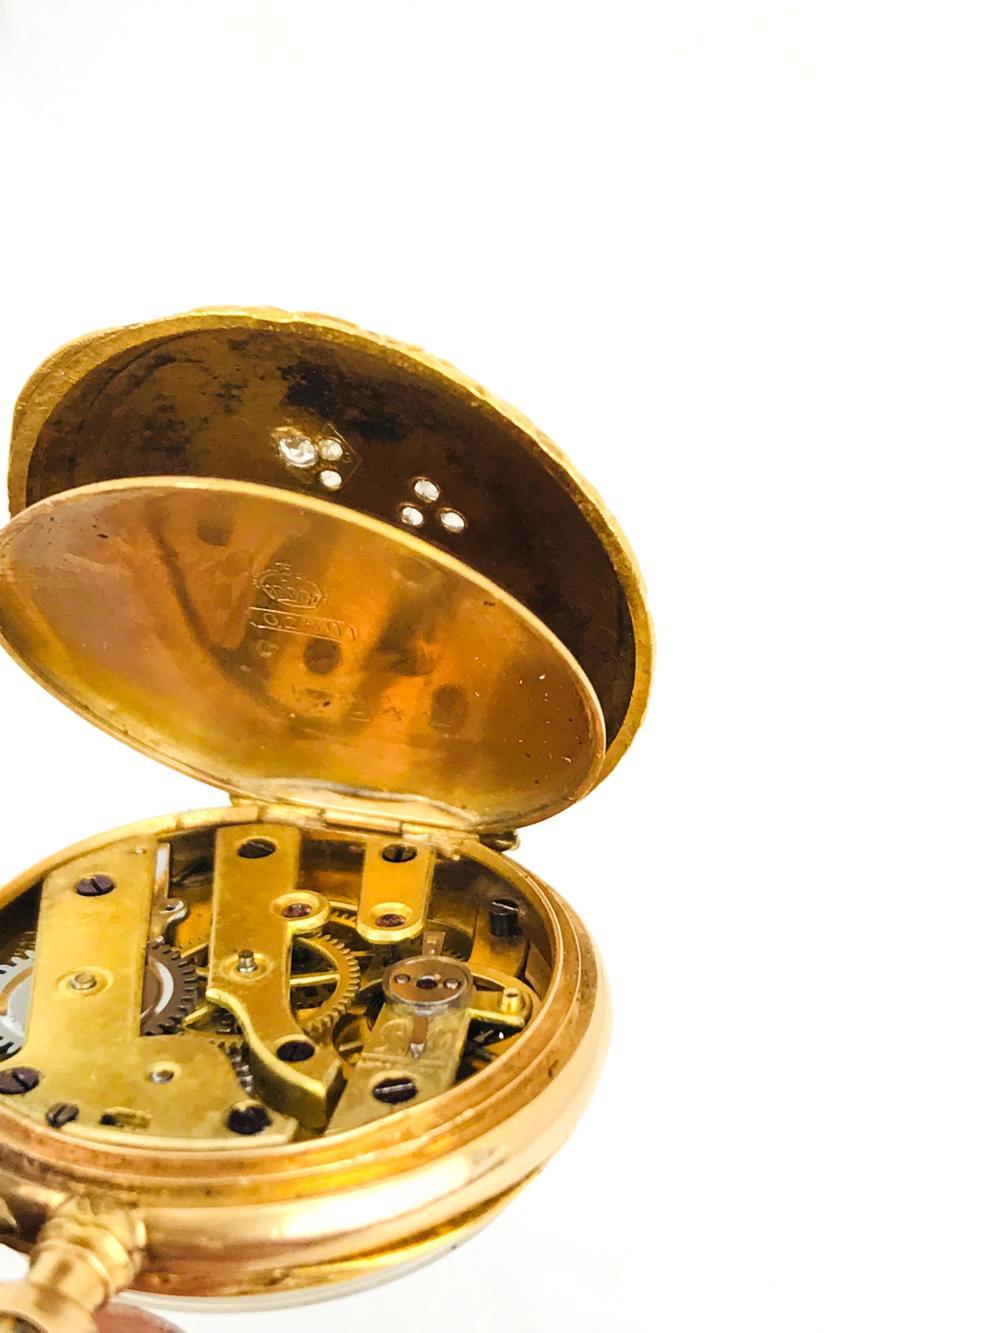 Lot 9034: Rare, 18 Karat Pendant Victorian, Shamrock Rose-Cut Diamond Pocket Watch